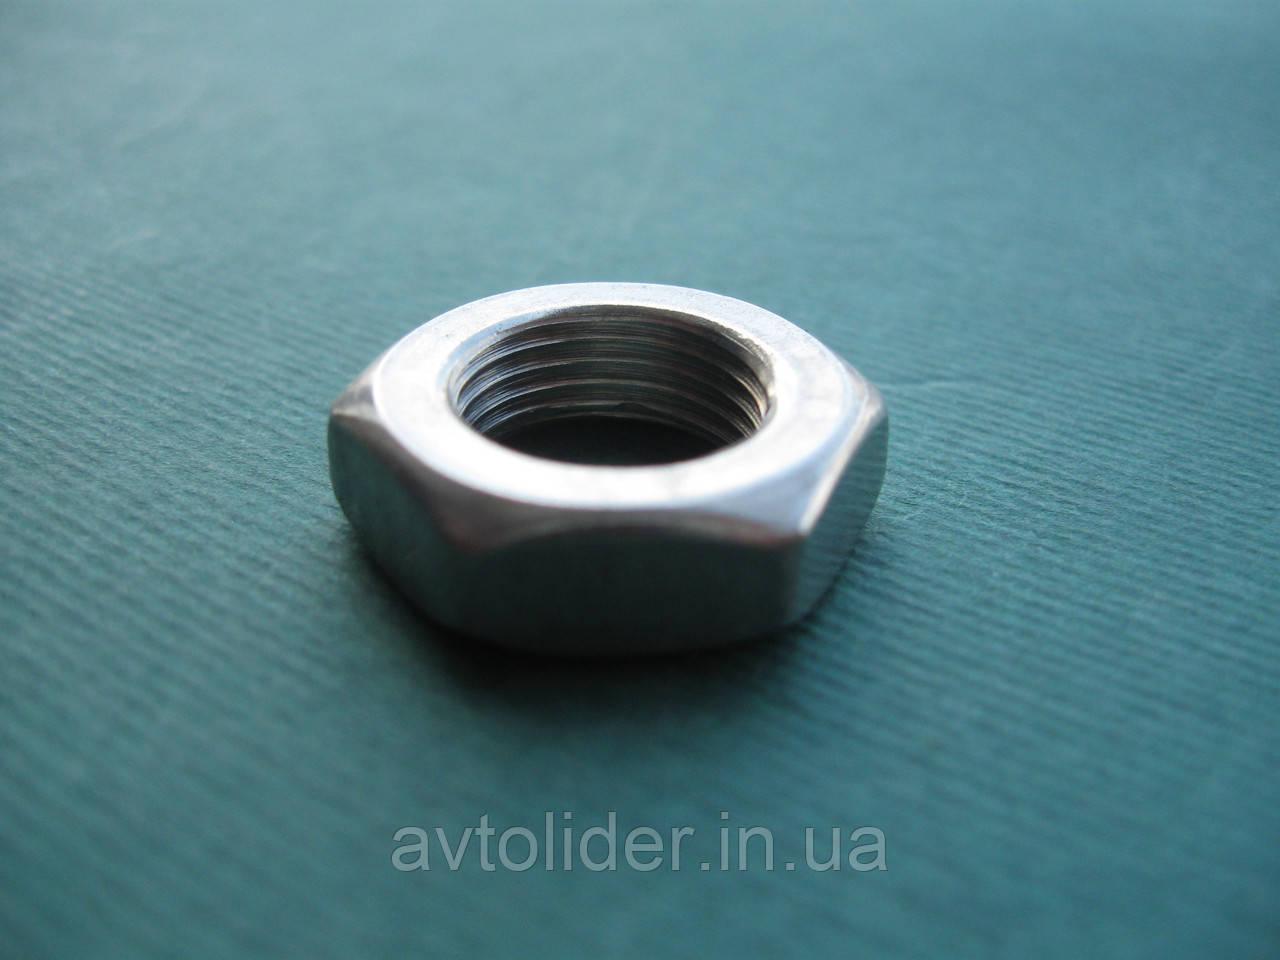 DIN 439 (ГОСТ 5615-70; ISO 4035) - Нержавеющая гайка шестигранная низкая